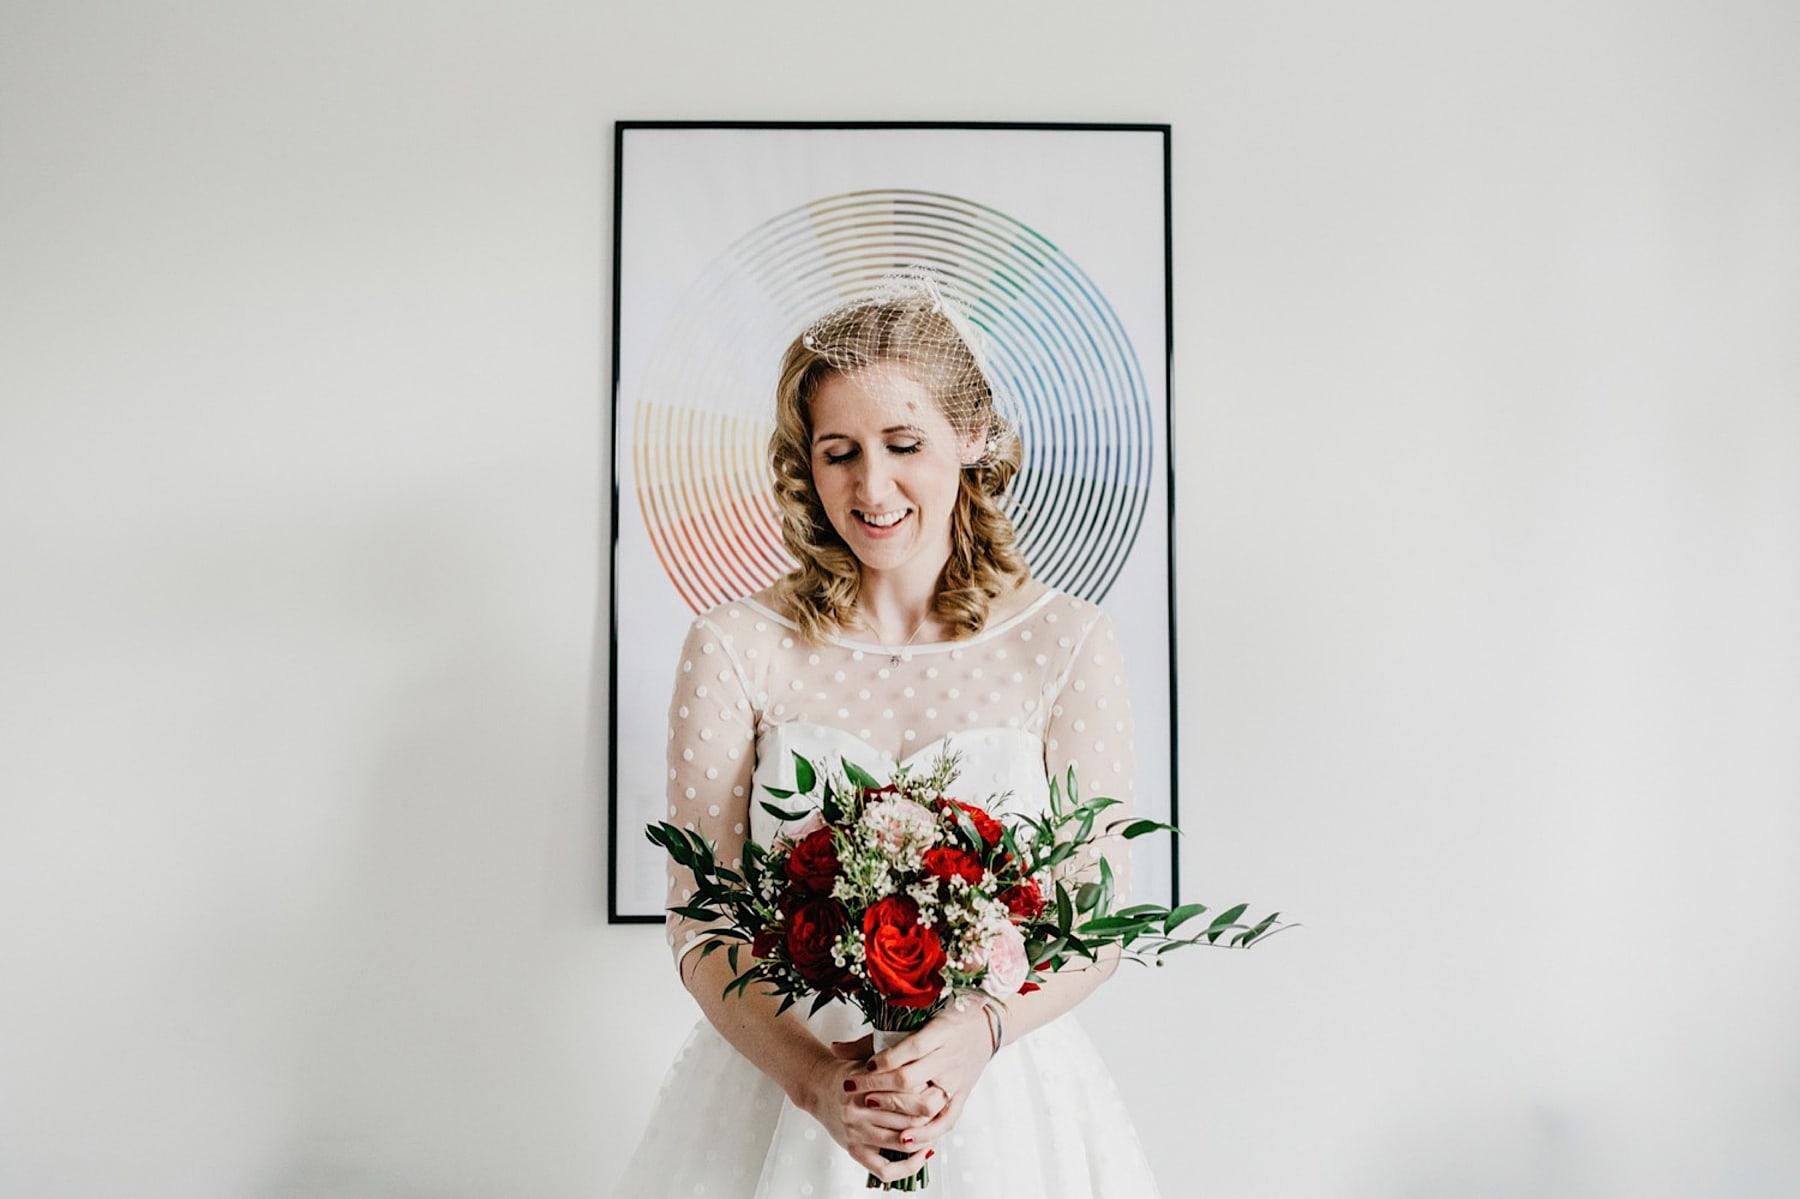 colourful symmetrical bride photo